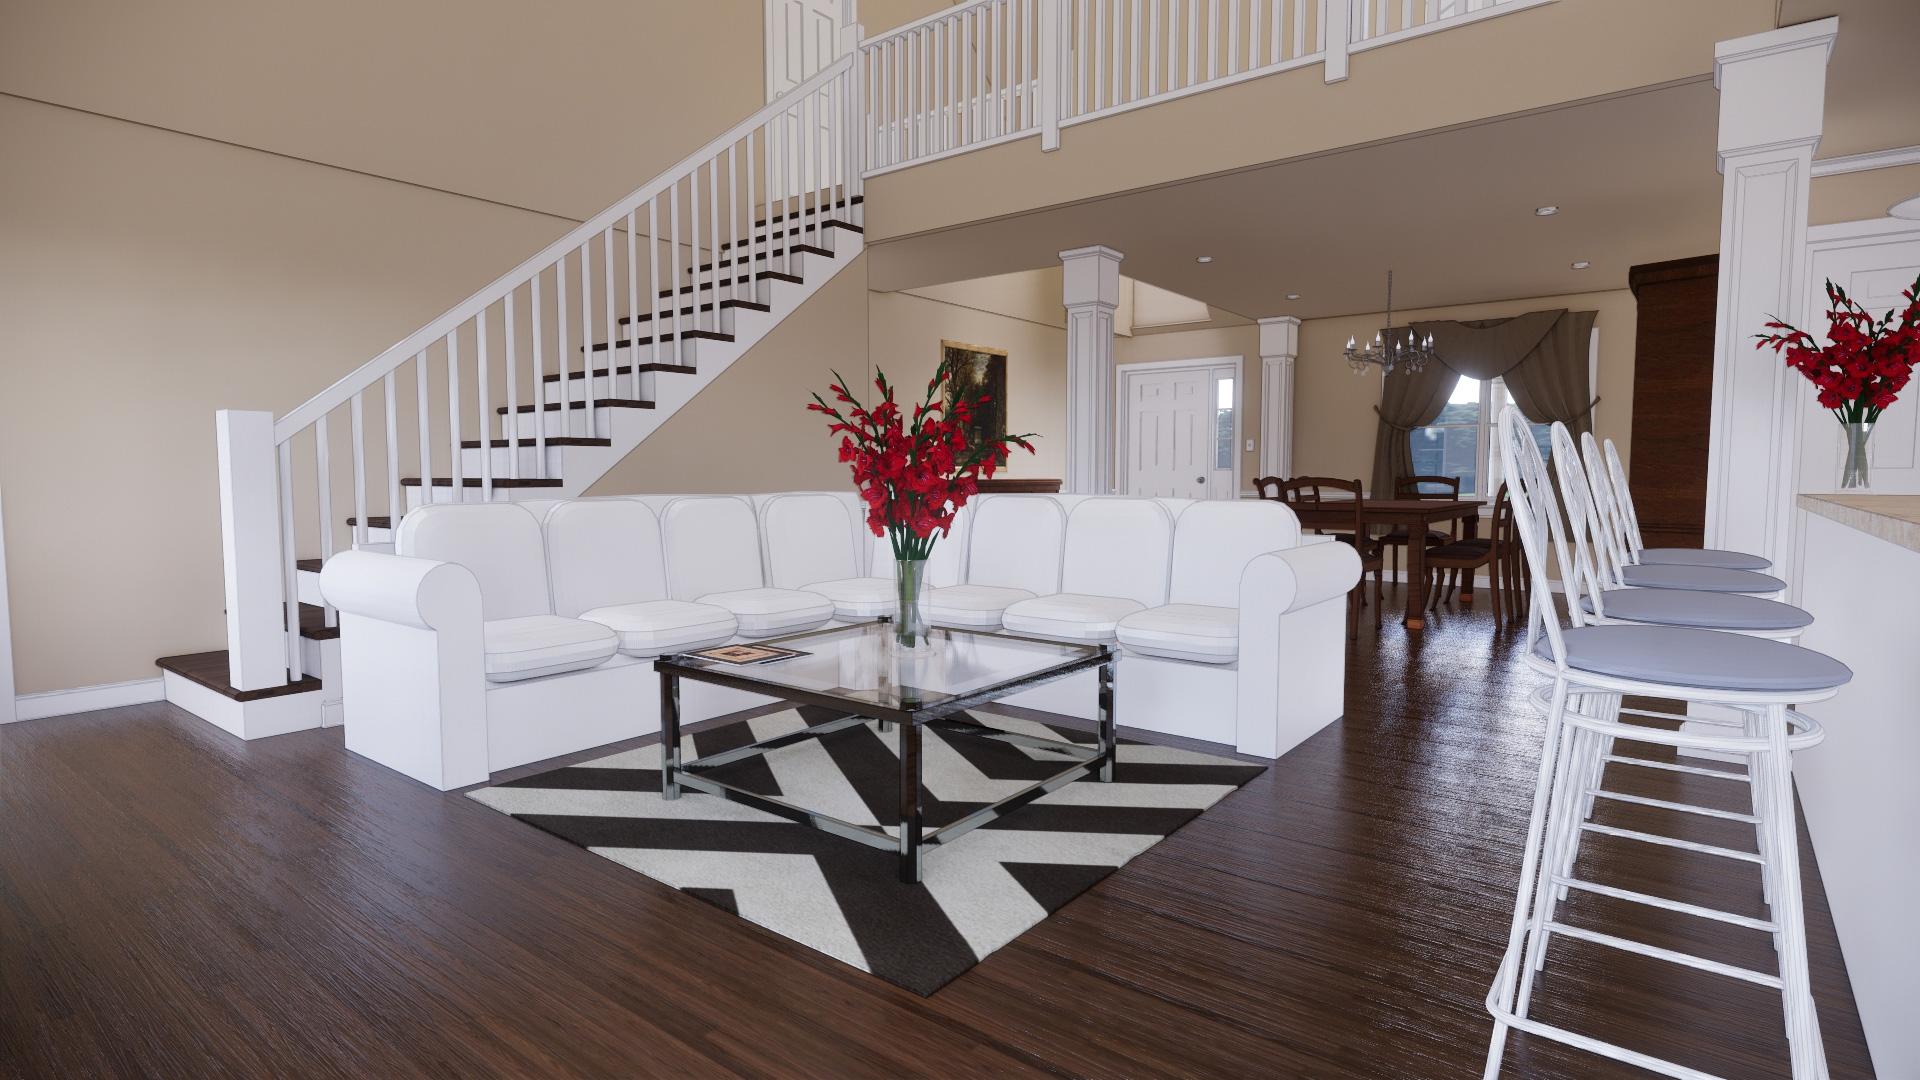 https://go2homedesigns.com/wp-content/uploads/2019/10/Living-Room-Render.jpg